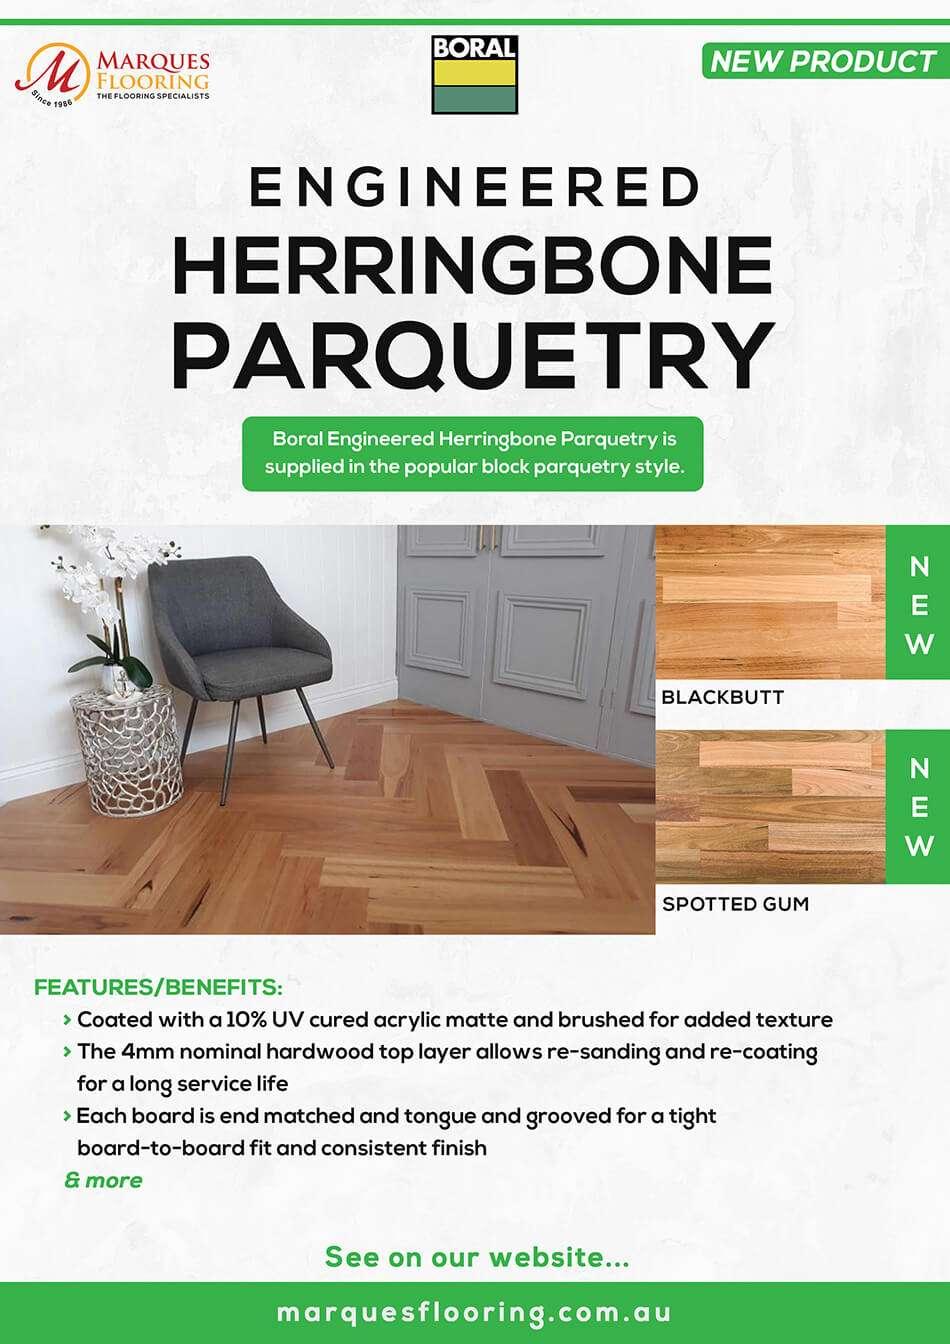 boral new herringbone parquetry_april_newproduct01 copy